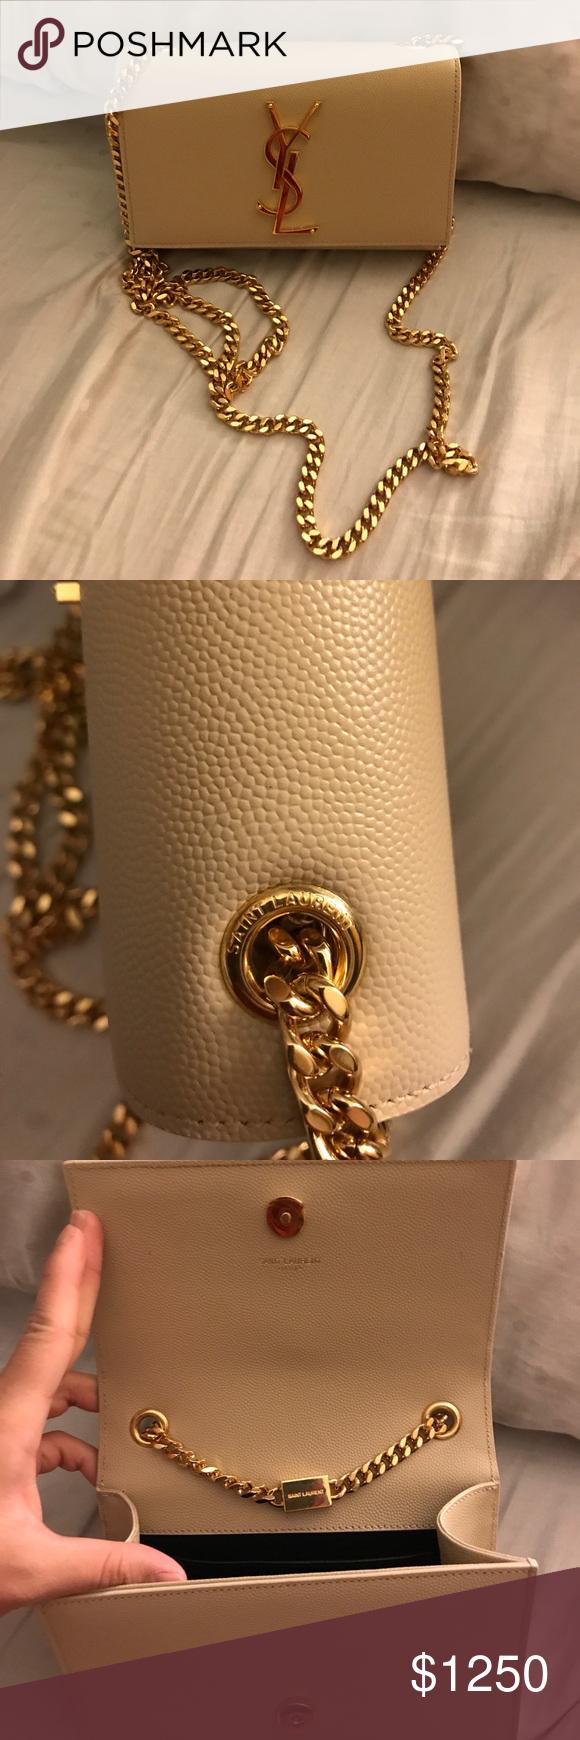 c1ba1a47cd8e Yves Saint Laurent Small Kate Chain Bag in powder PLEASE READ ‼ Authentic  Yves Saint